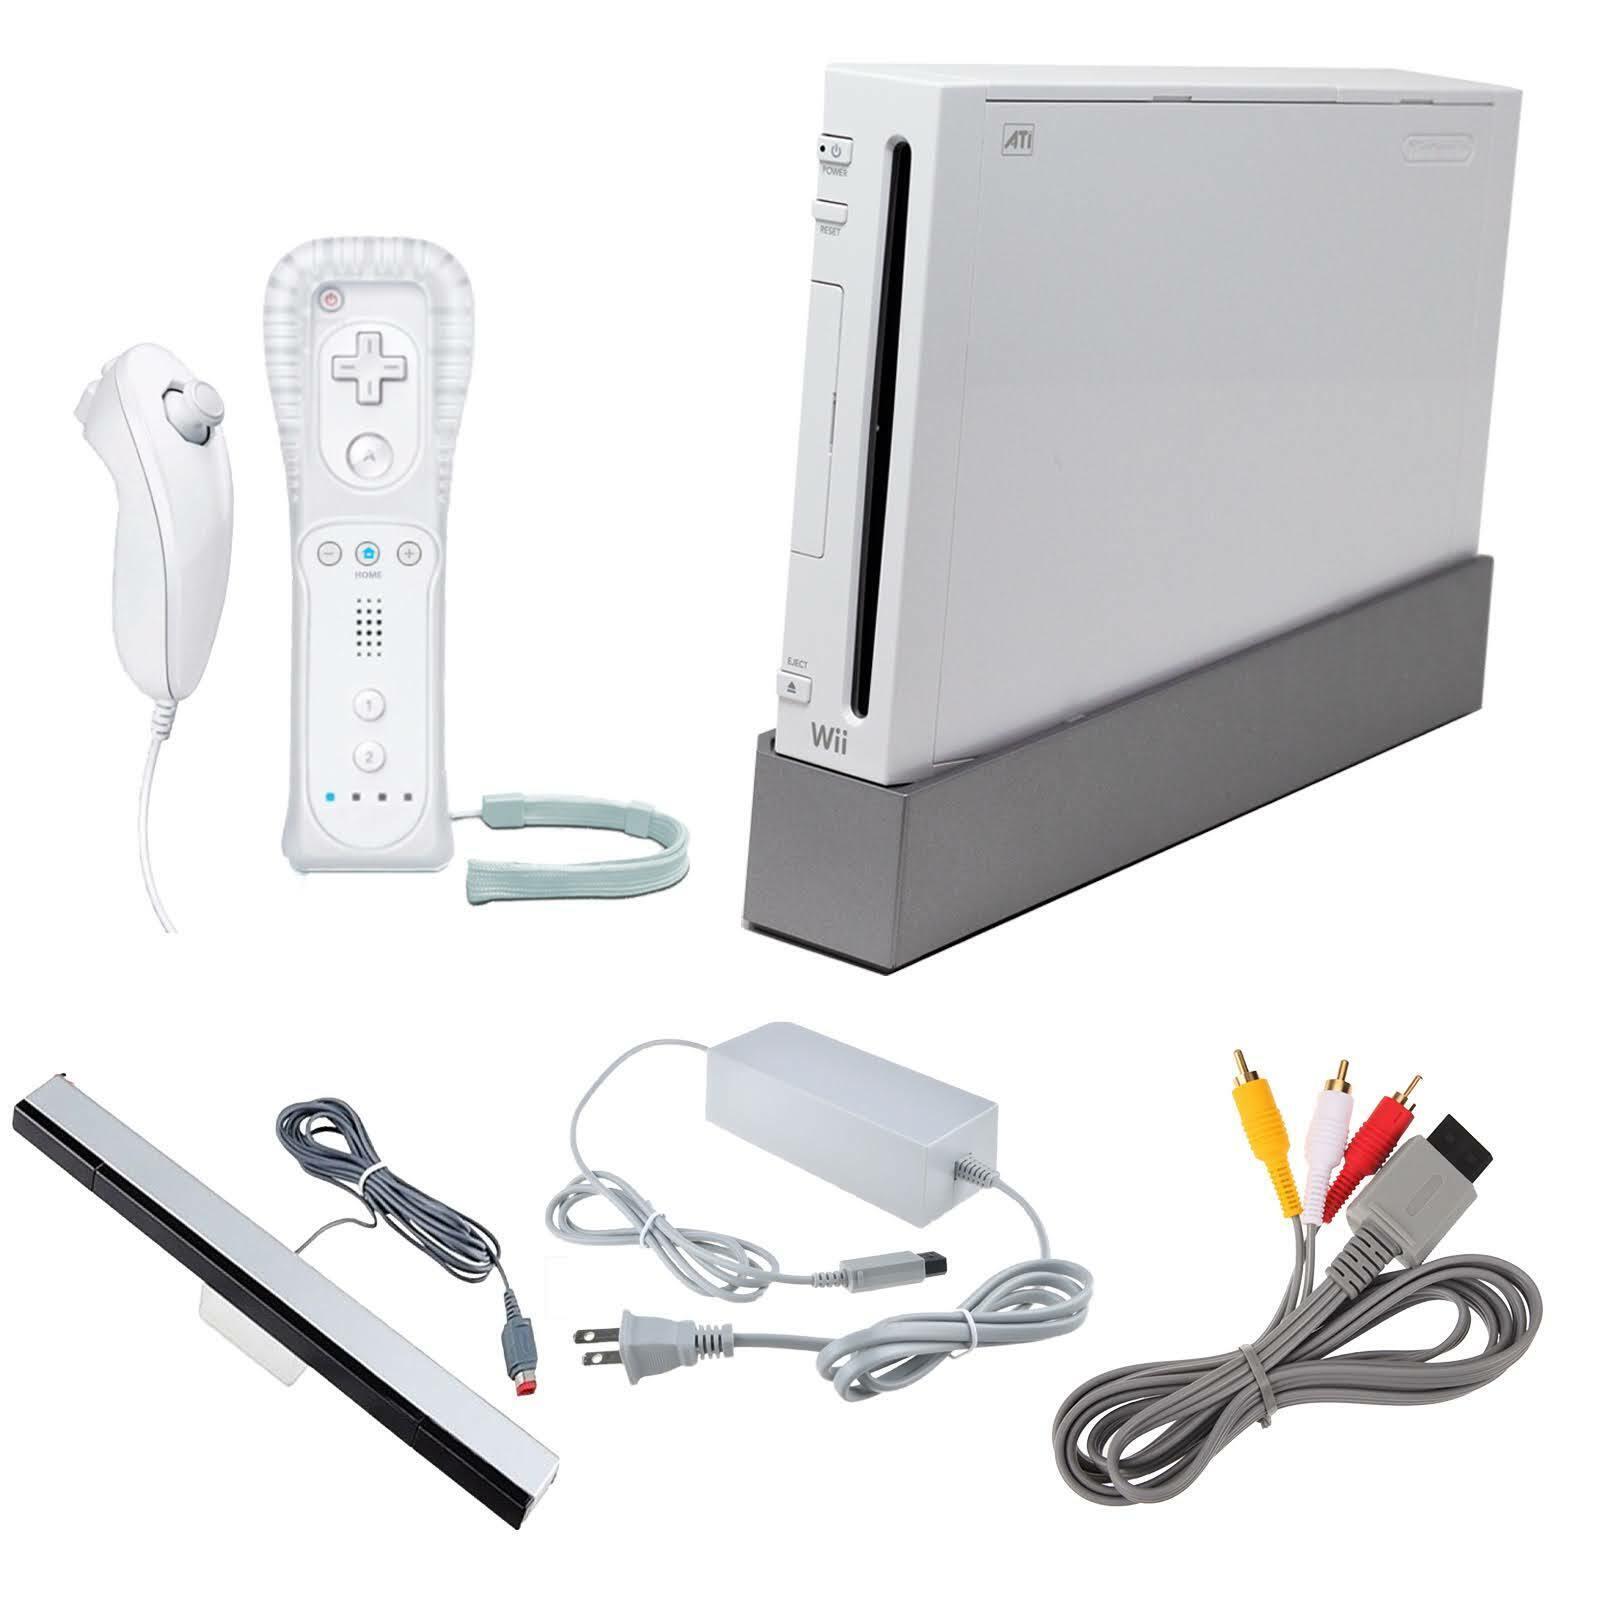 Nintendo Wii White Video Game Console (RVL-001) Bundle - GameCube Compatible